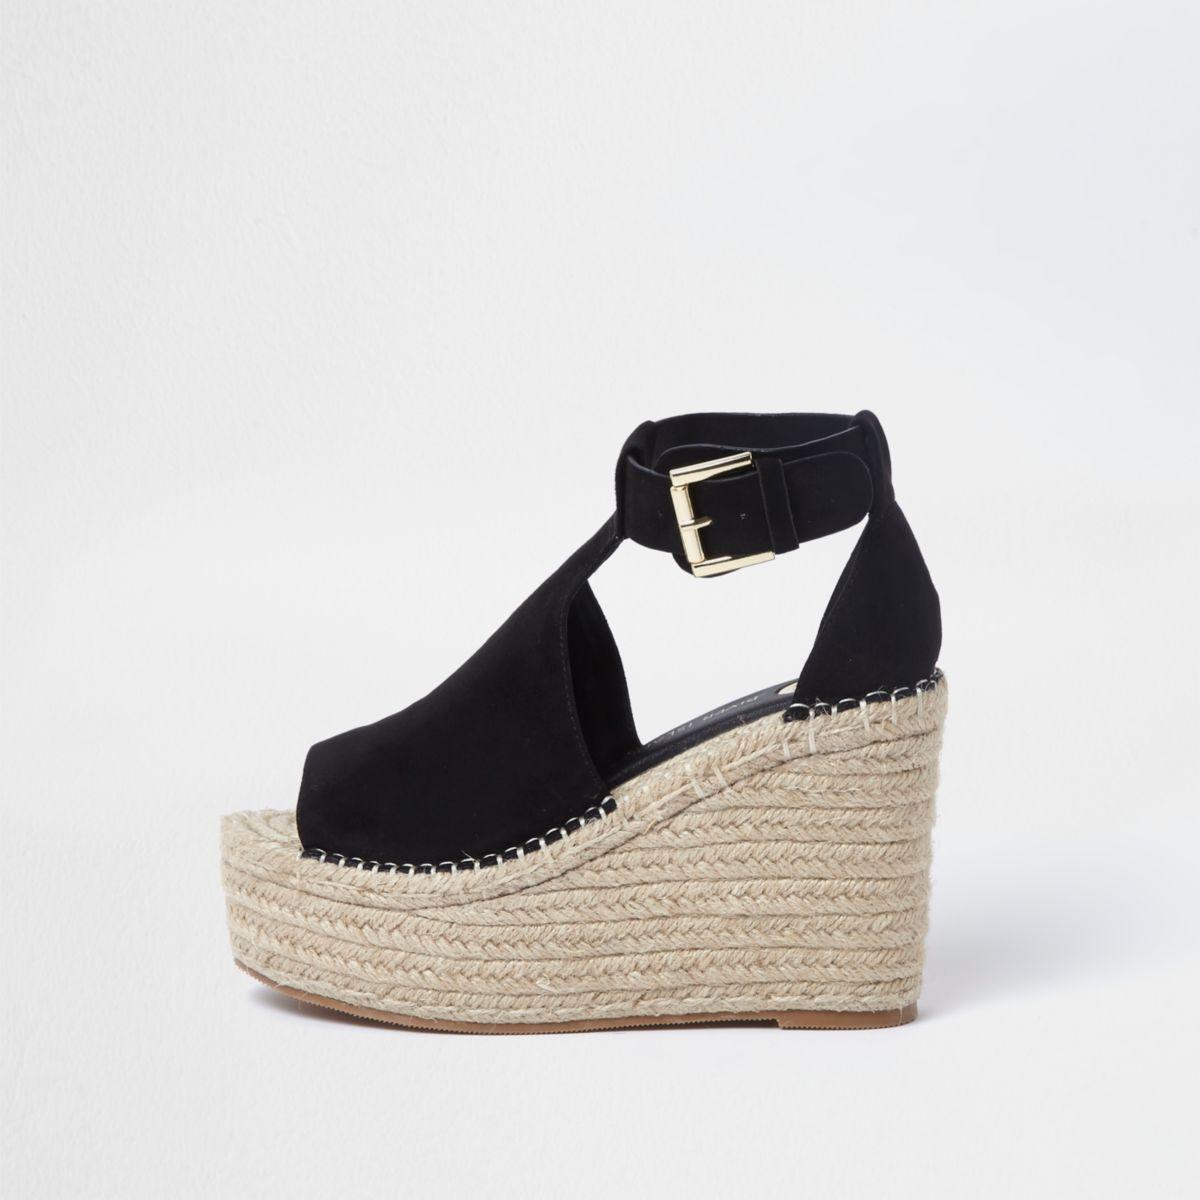 black espadrille platform wedges sandals shoes amp boots